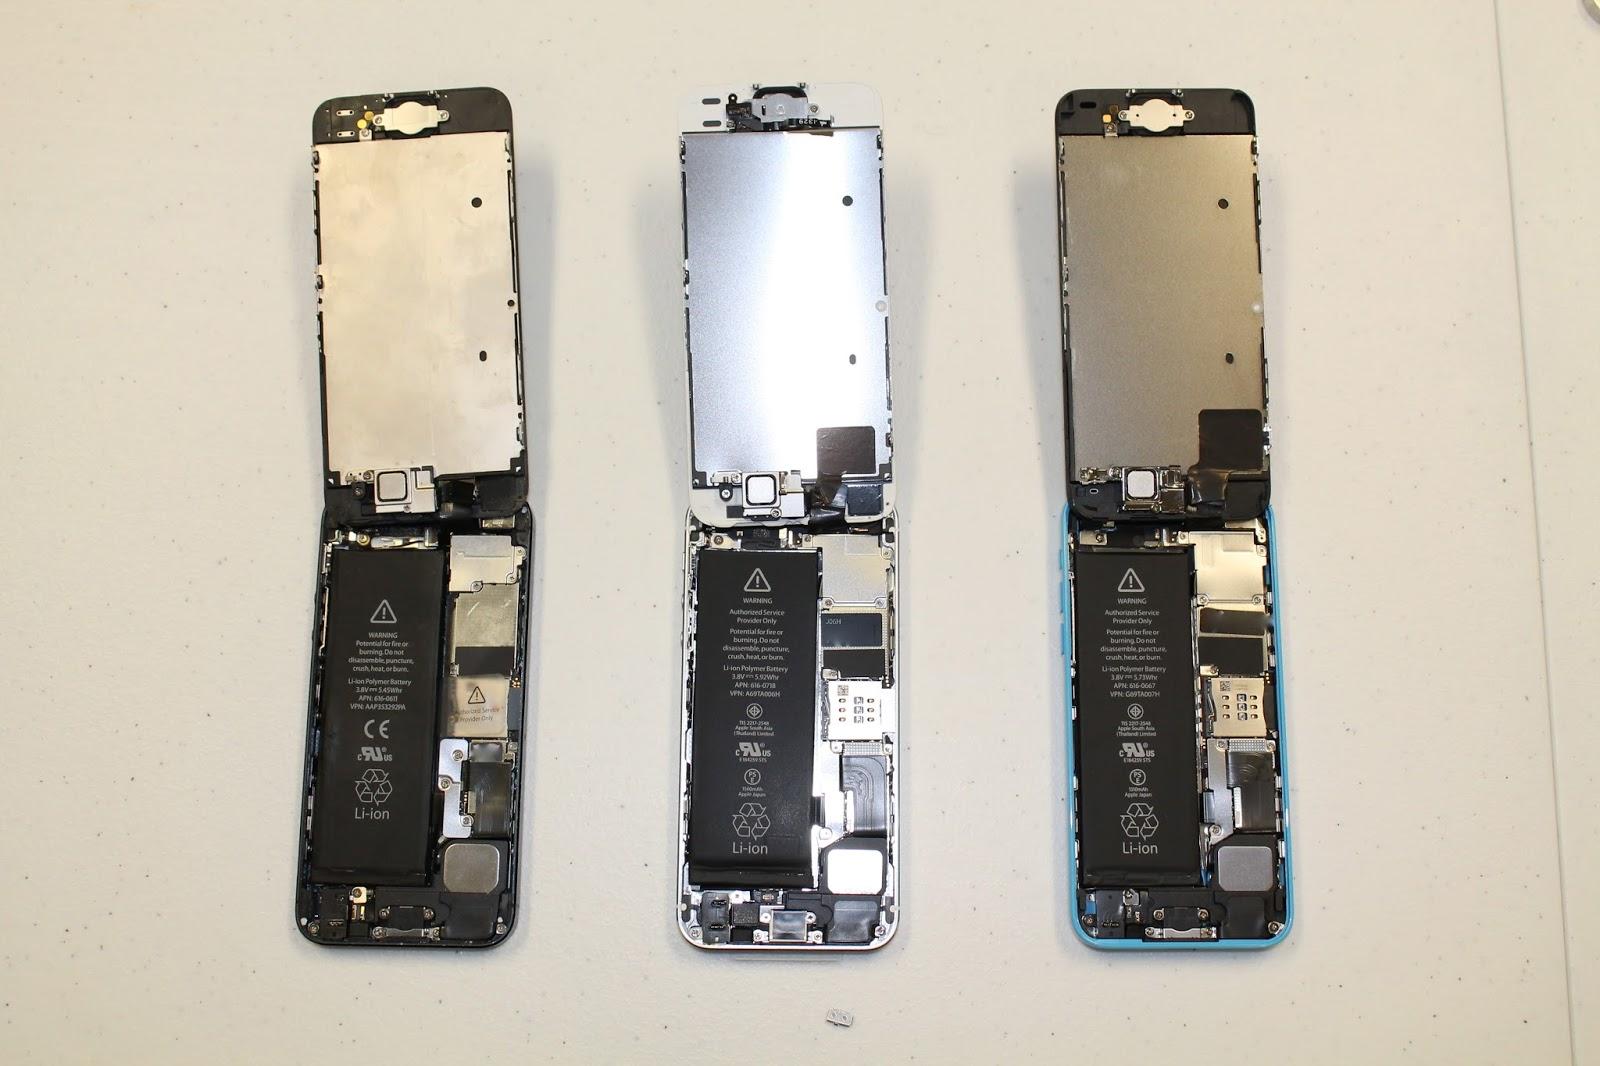 iExpert Australia - Teardown iPhone 5/iPhone 5C/iPhone 5S